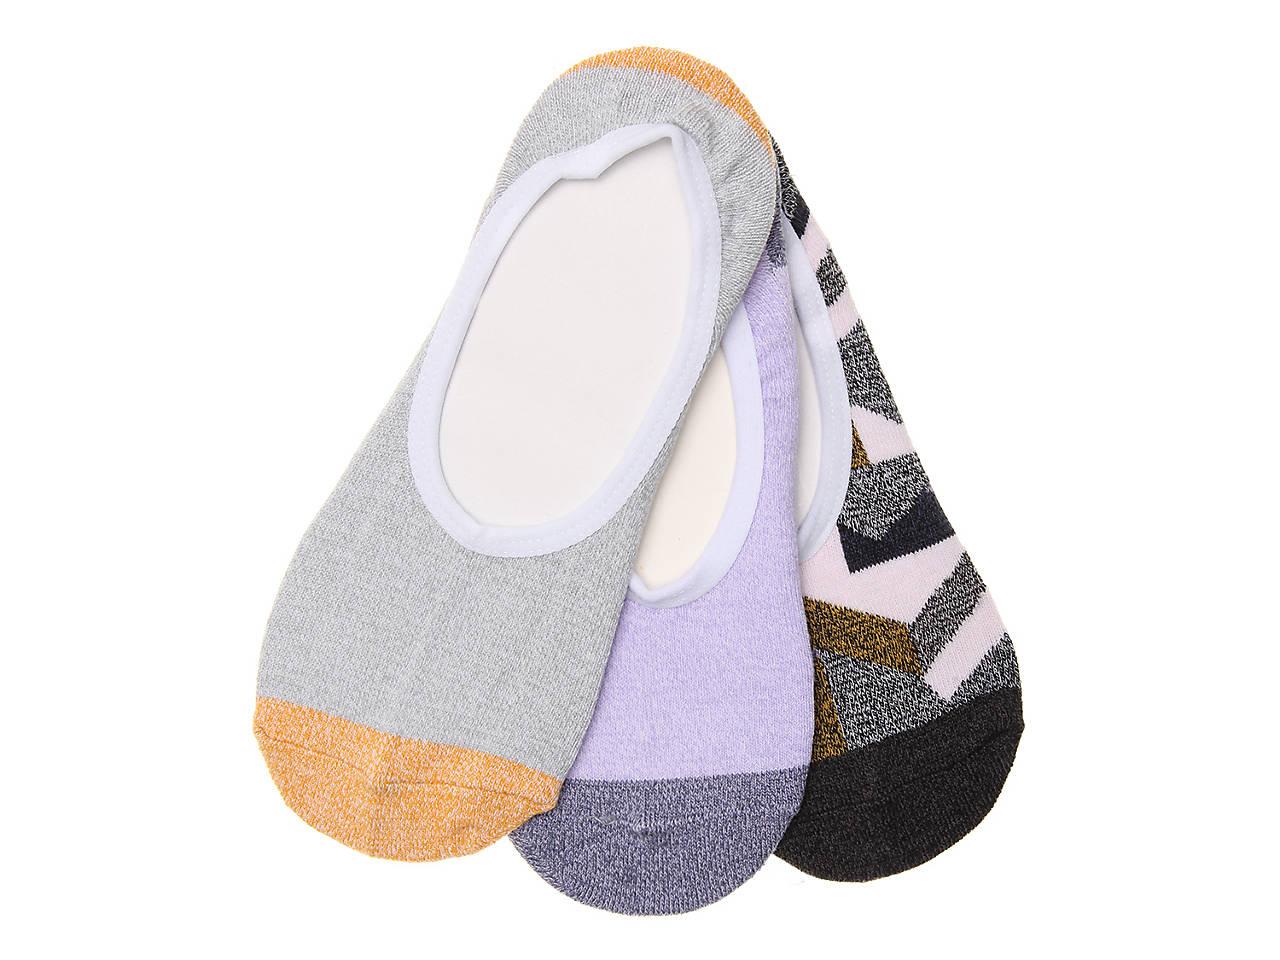 bdf77d29ad1d Vans Geo Knit Women s No Show Socks - 3 Pack Women s Handbags ...